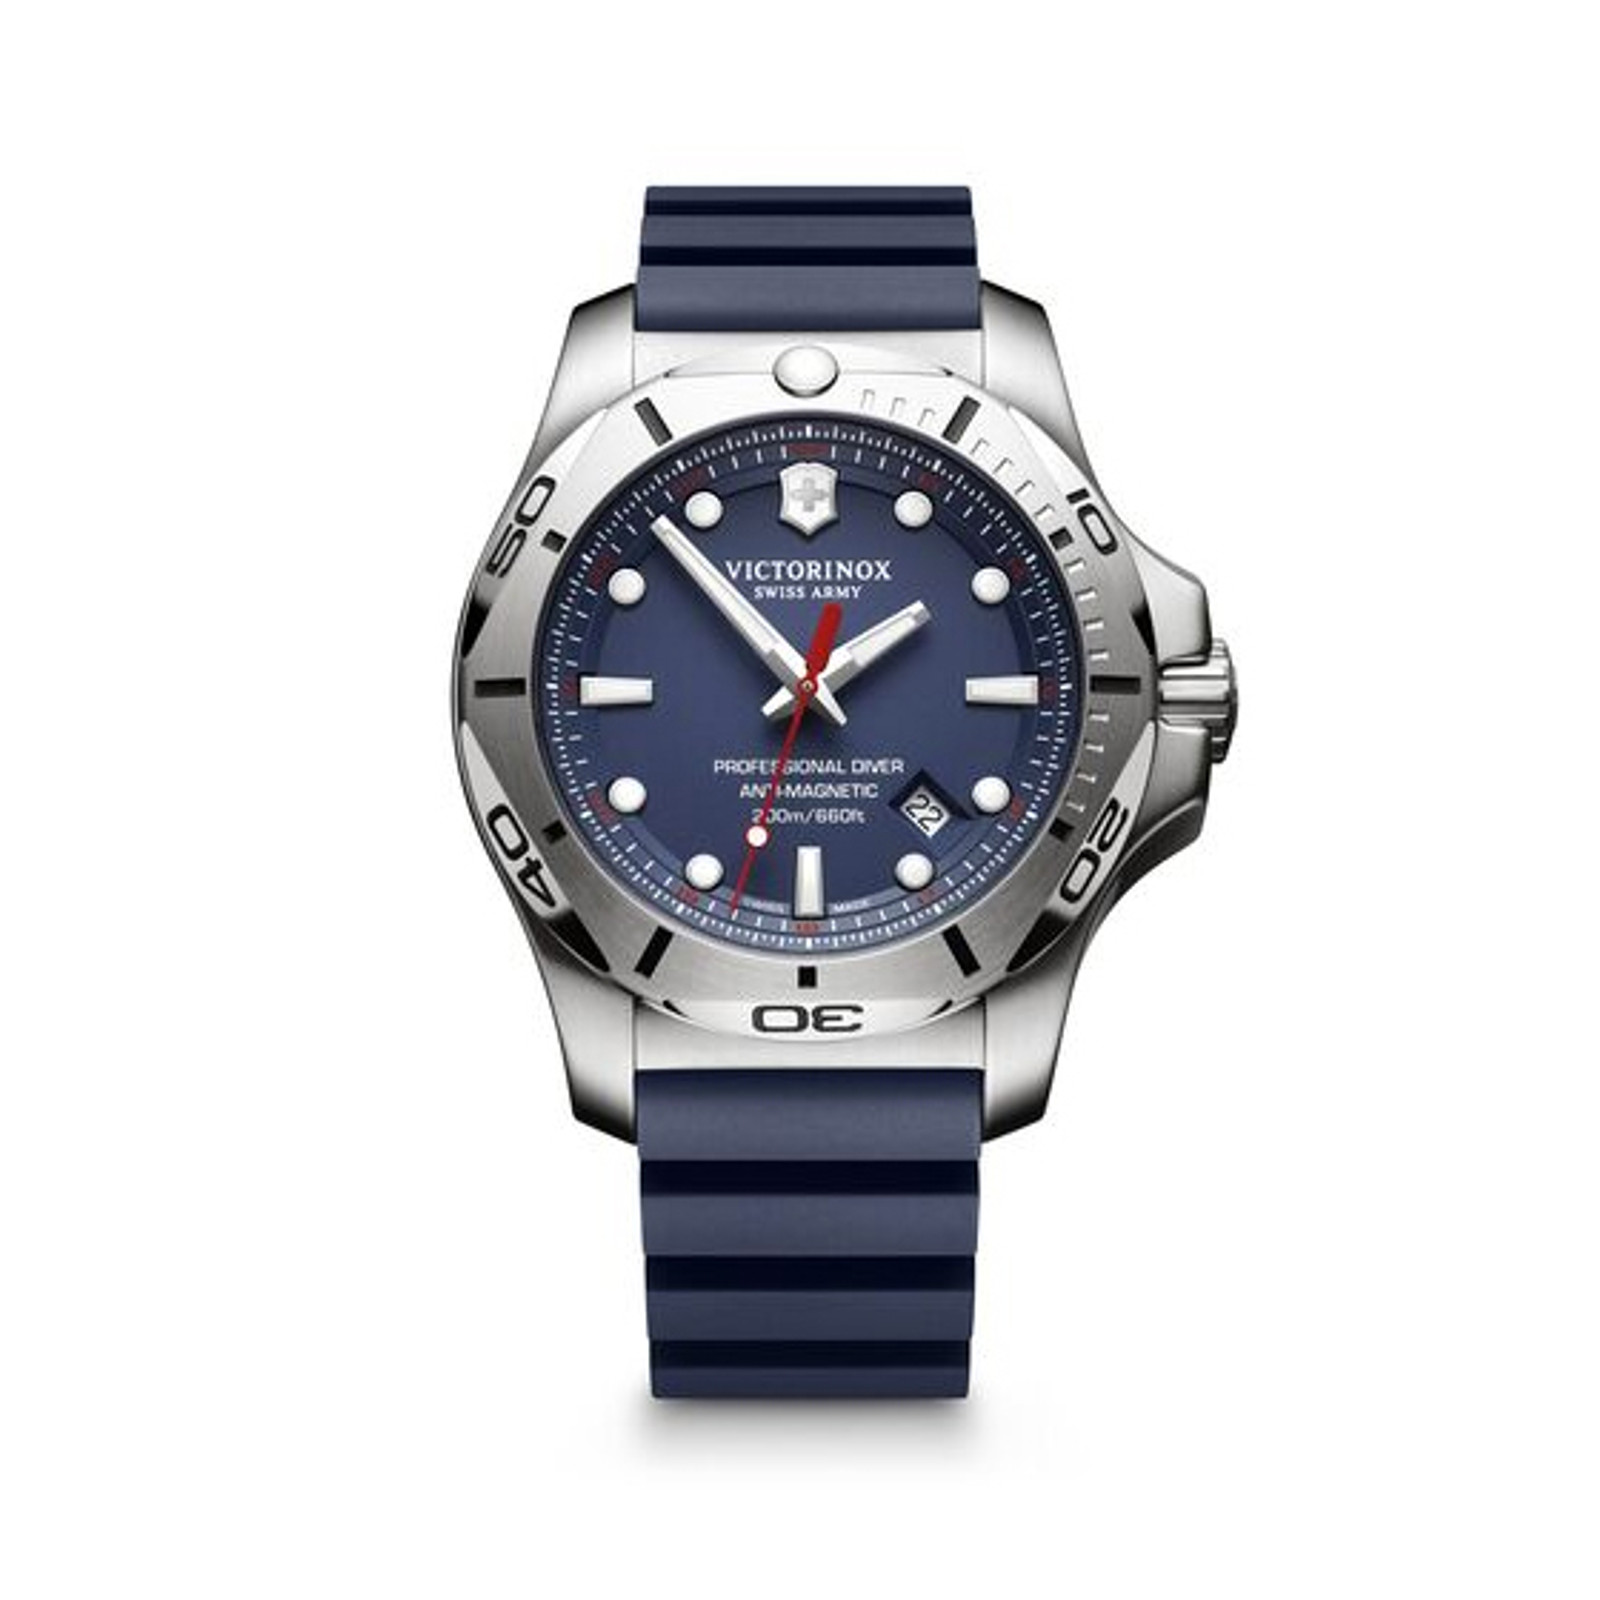 Victorinox INOX Professional Diver  (241734)